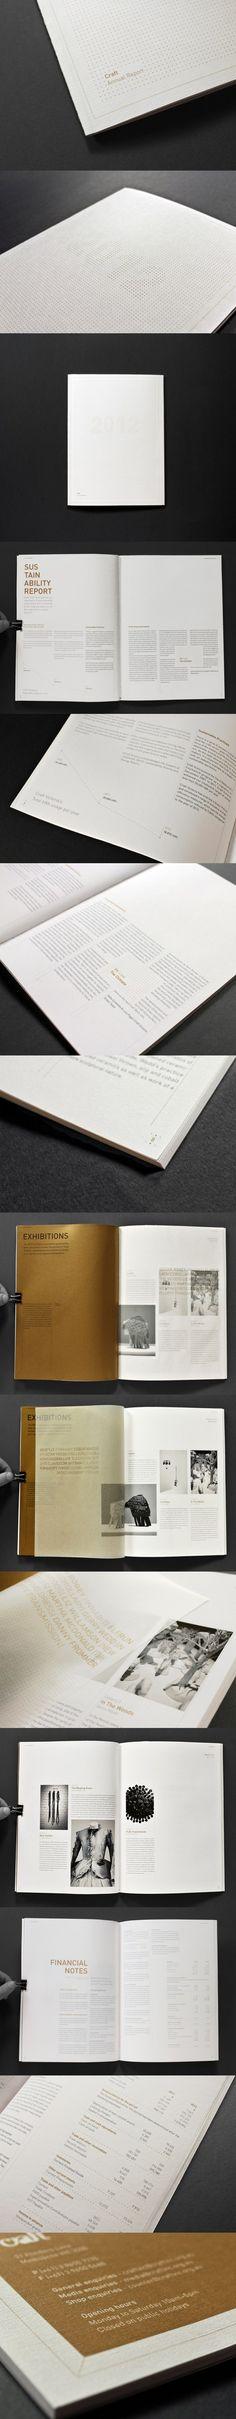 Annual report - Craft Victoria via http://www.behance.net/gallery/Annual-report-Craft-Victoria/4213273